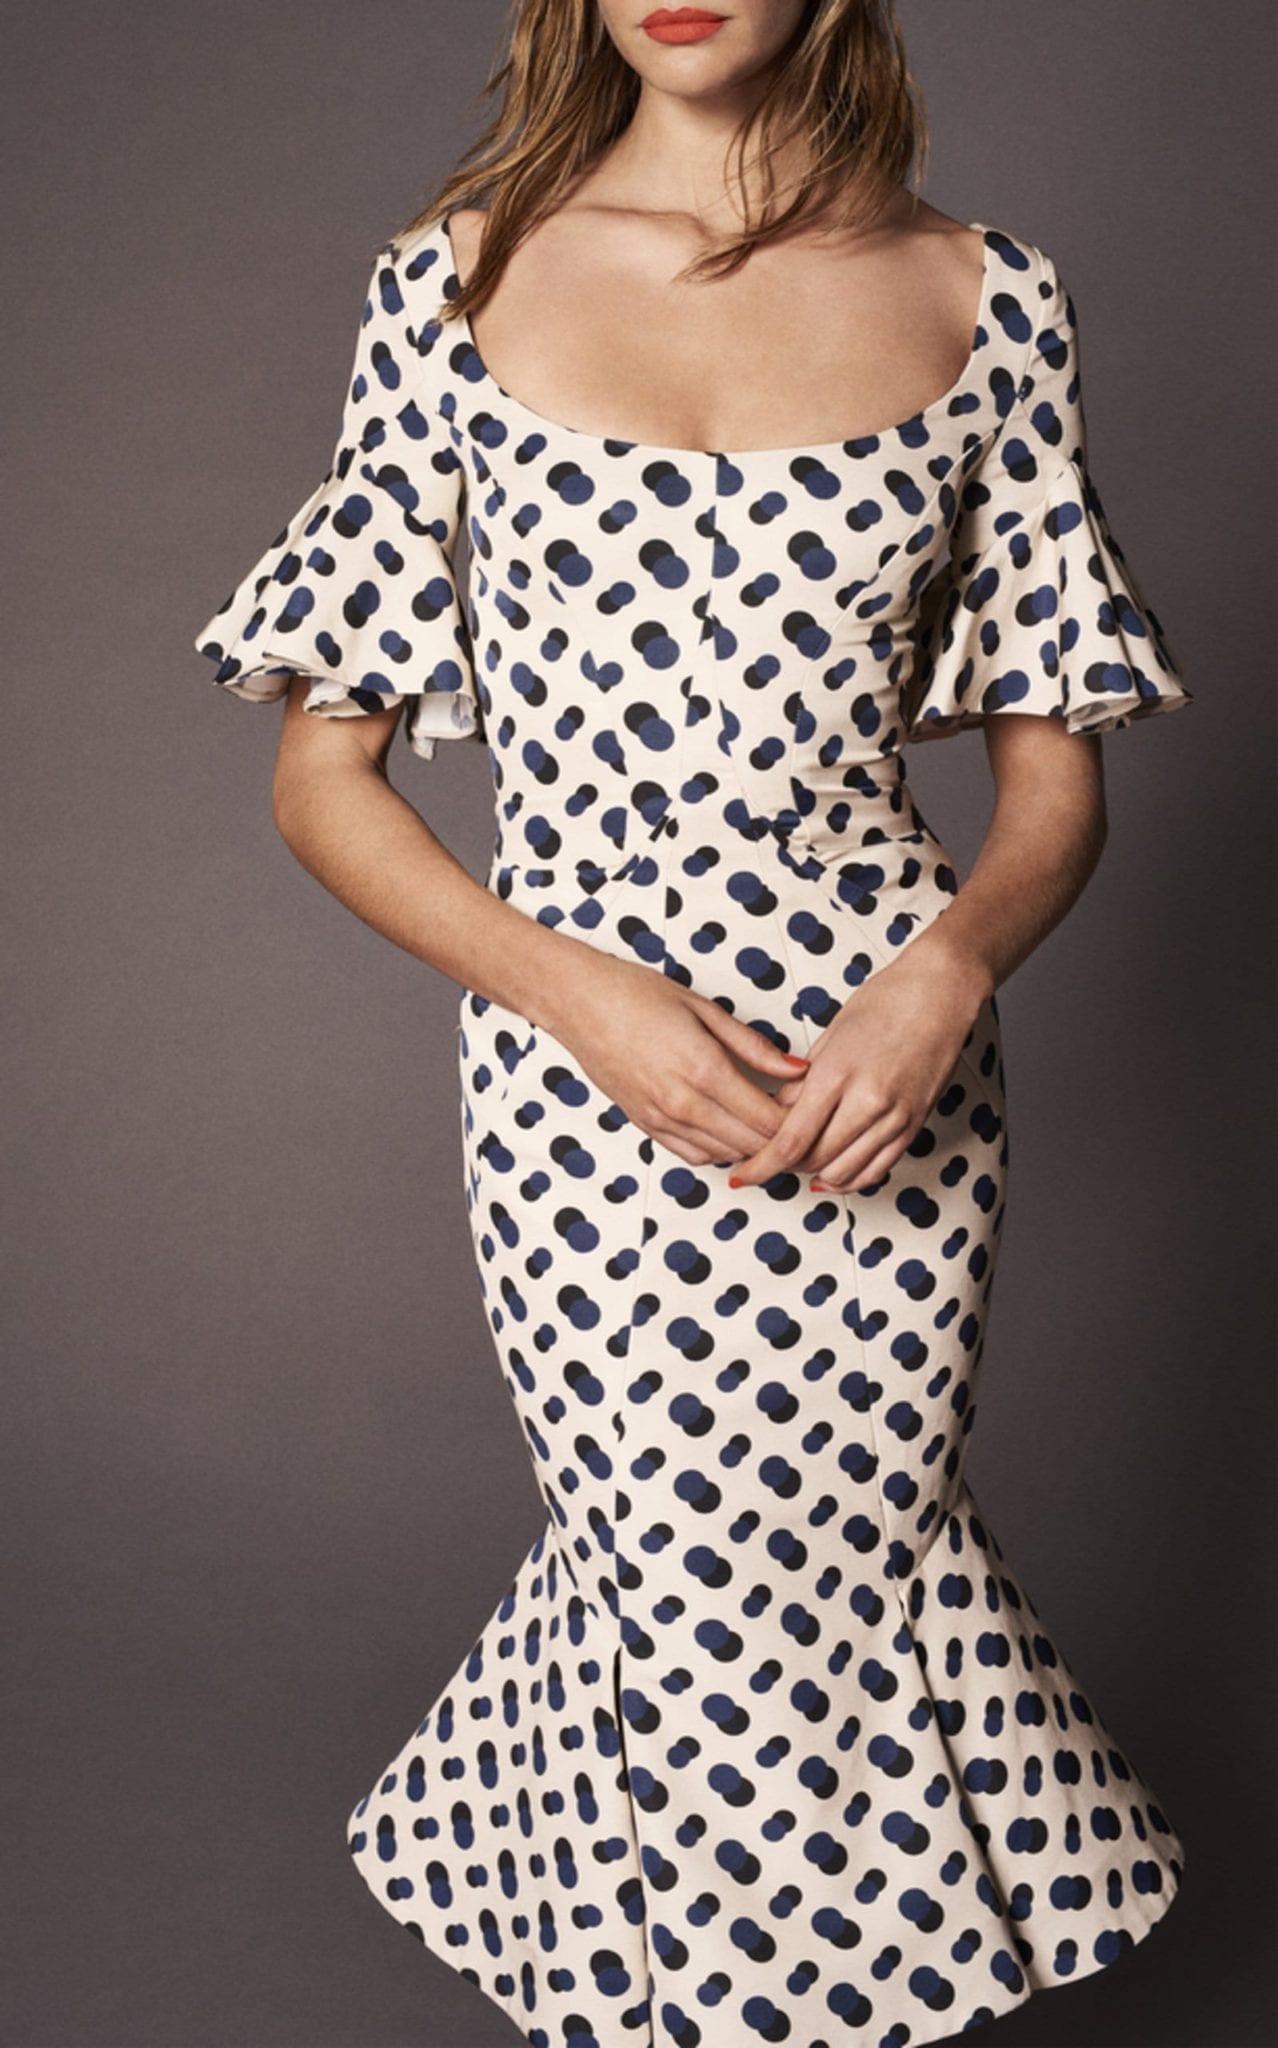 ZAC POSEN Ruffled Sleeve Ivory / Printed Dress